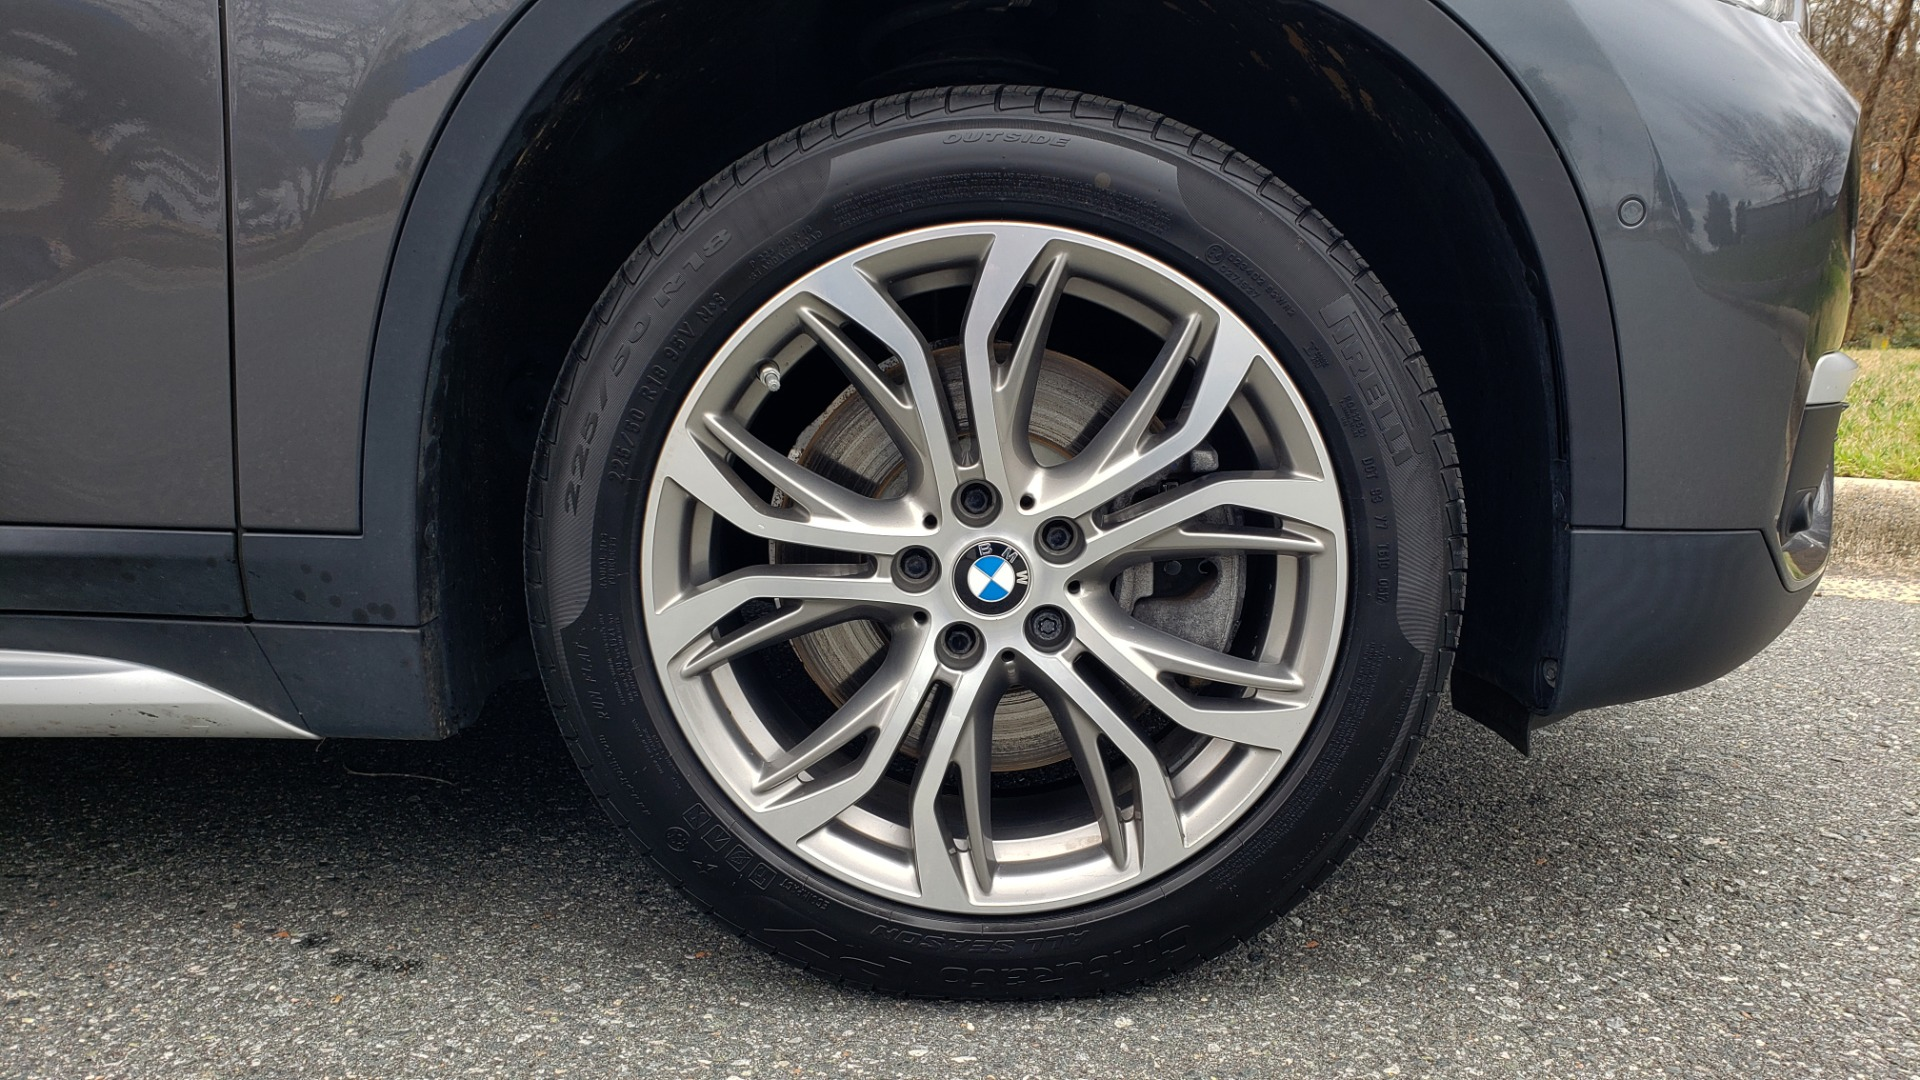 Used 2017 BMW X1 XDRIVE28I / PREM PKG / DRIVER ASST / NAV / CLD WTHR for sale Sold at Formula Imports in Charlotte NC 28227 86